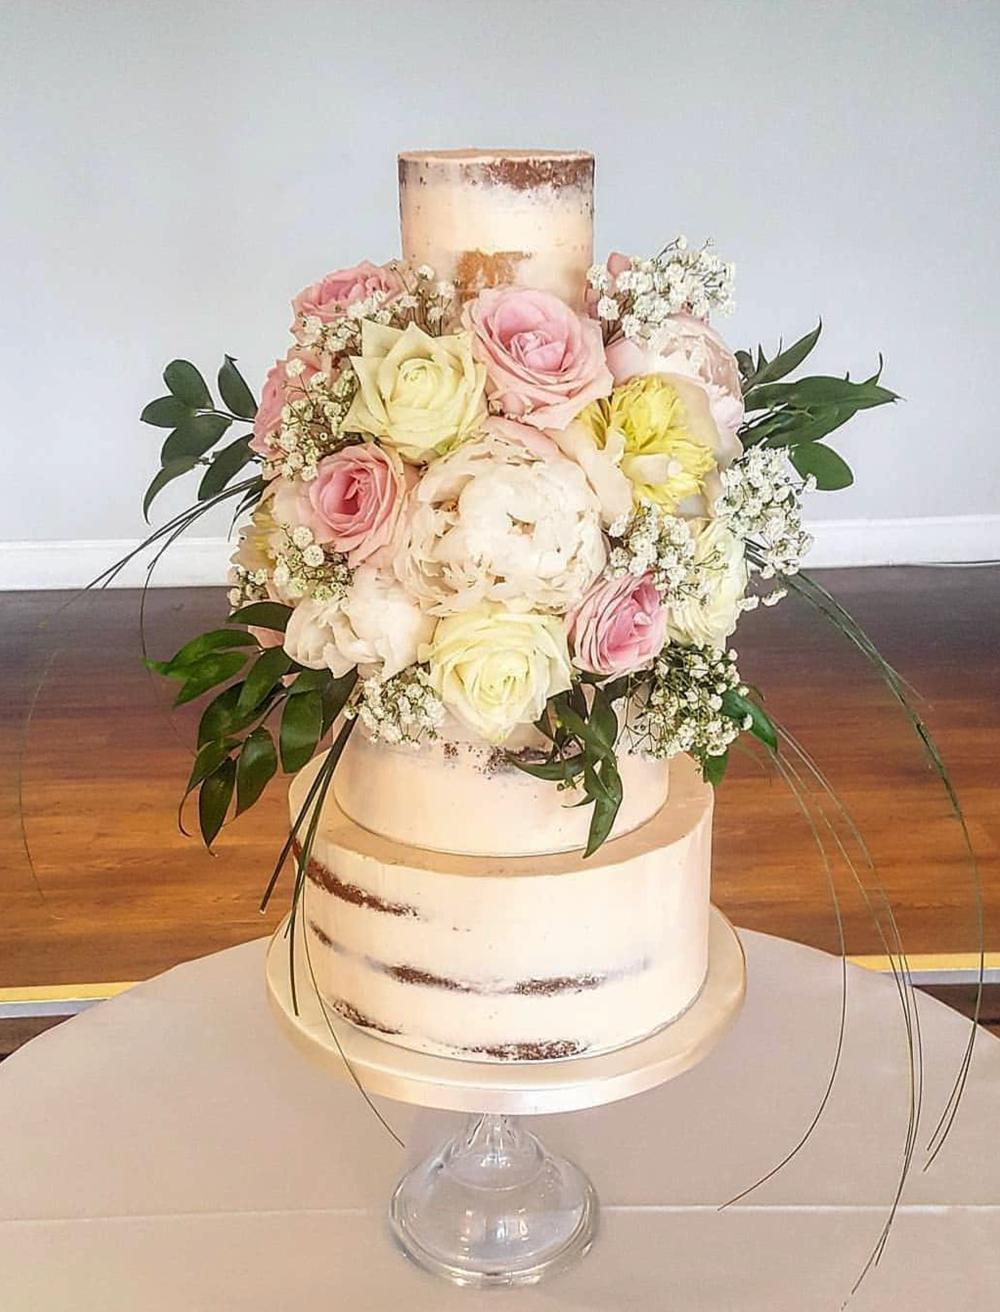 DOTTY ROSE CAKE DESIGN NAKED 4 TIER WEDDING CAKE.png